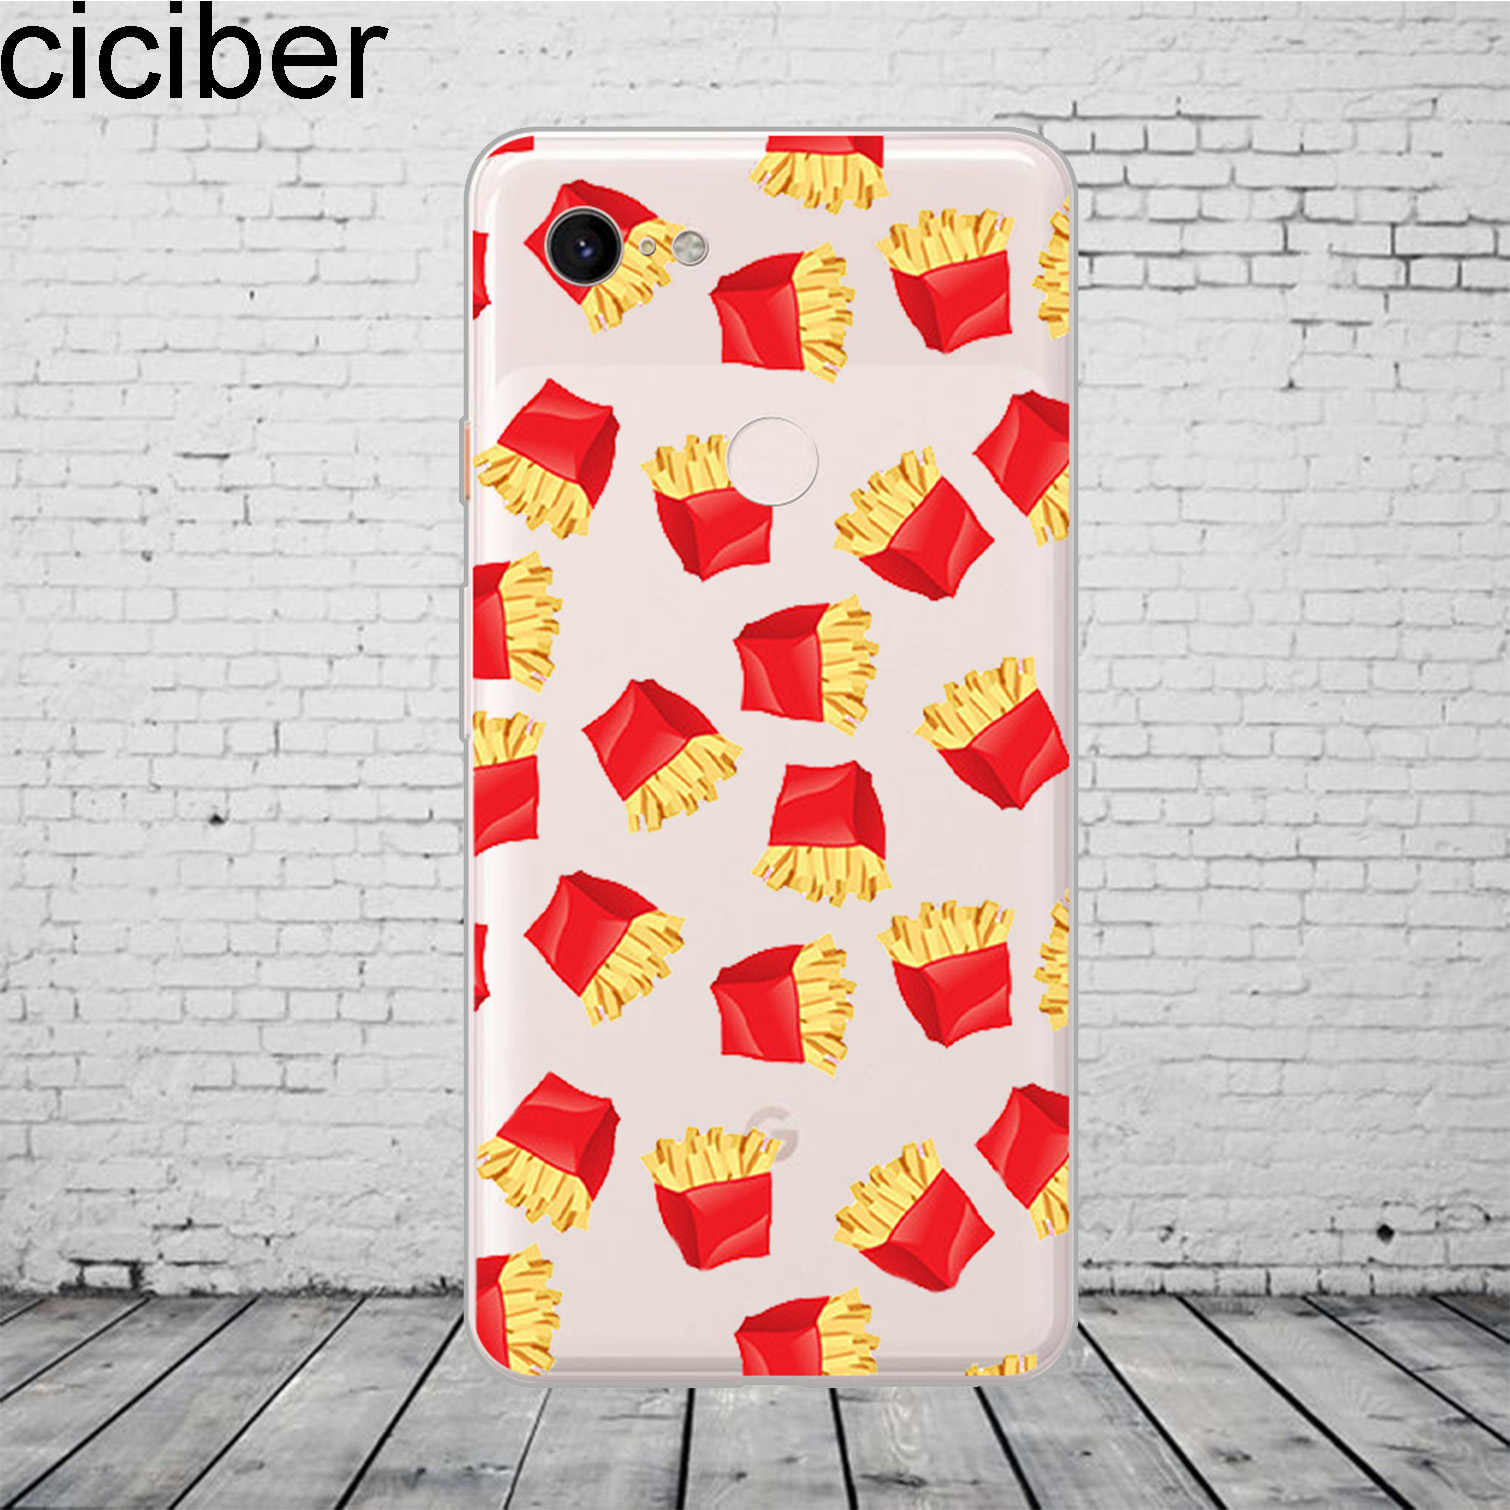 Ciciber Nourriture Frites Cola Burger Modele Coque De Telephone Pour Google Pixel 3 2 Xl Couverture En Silicone Souple Pour Pixel 3xl 2xl Coque Funda Capa Aliexpress